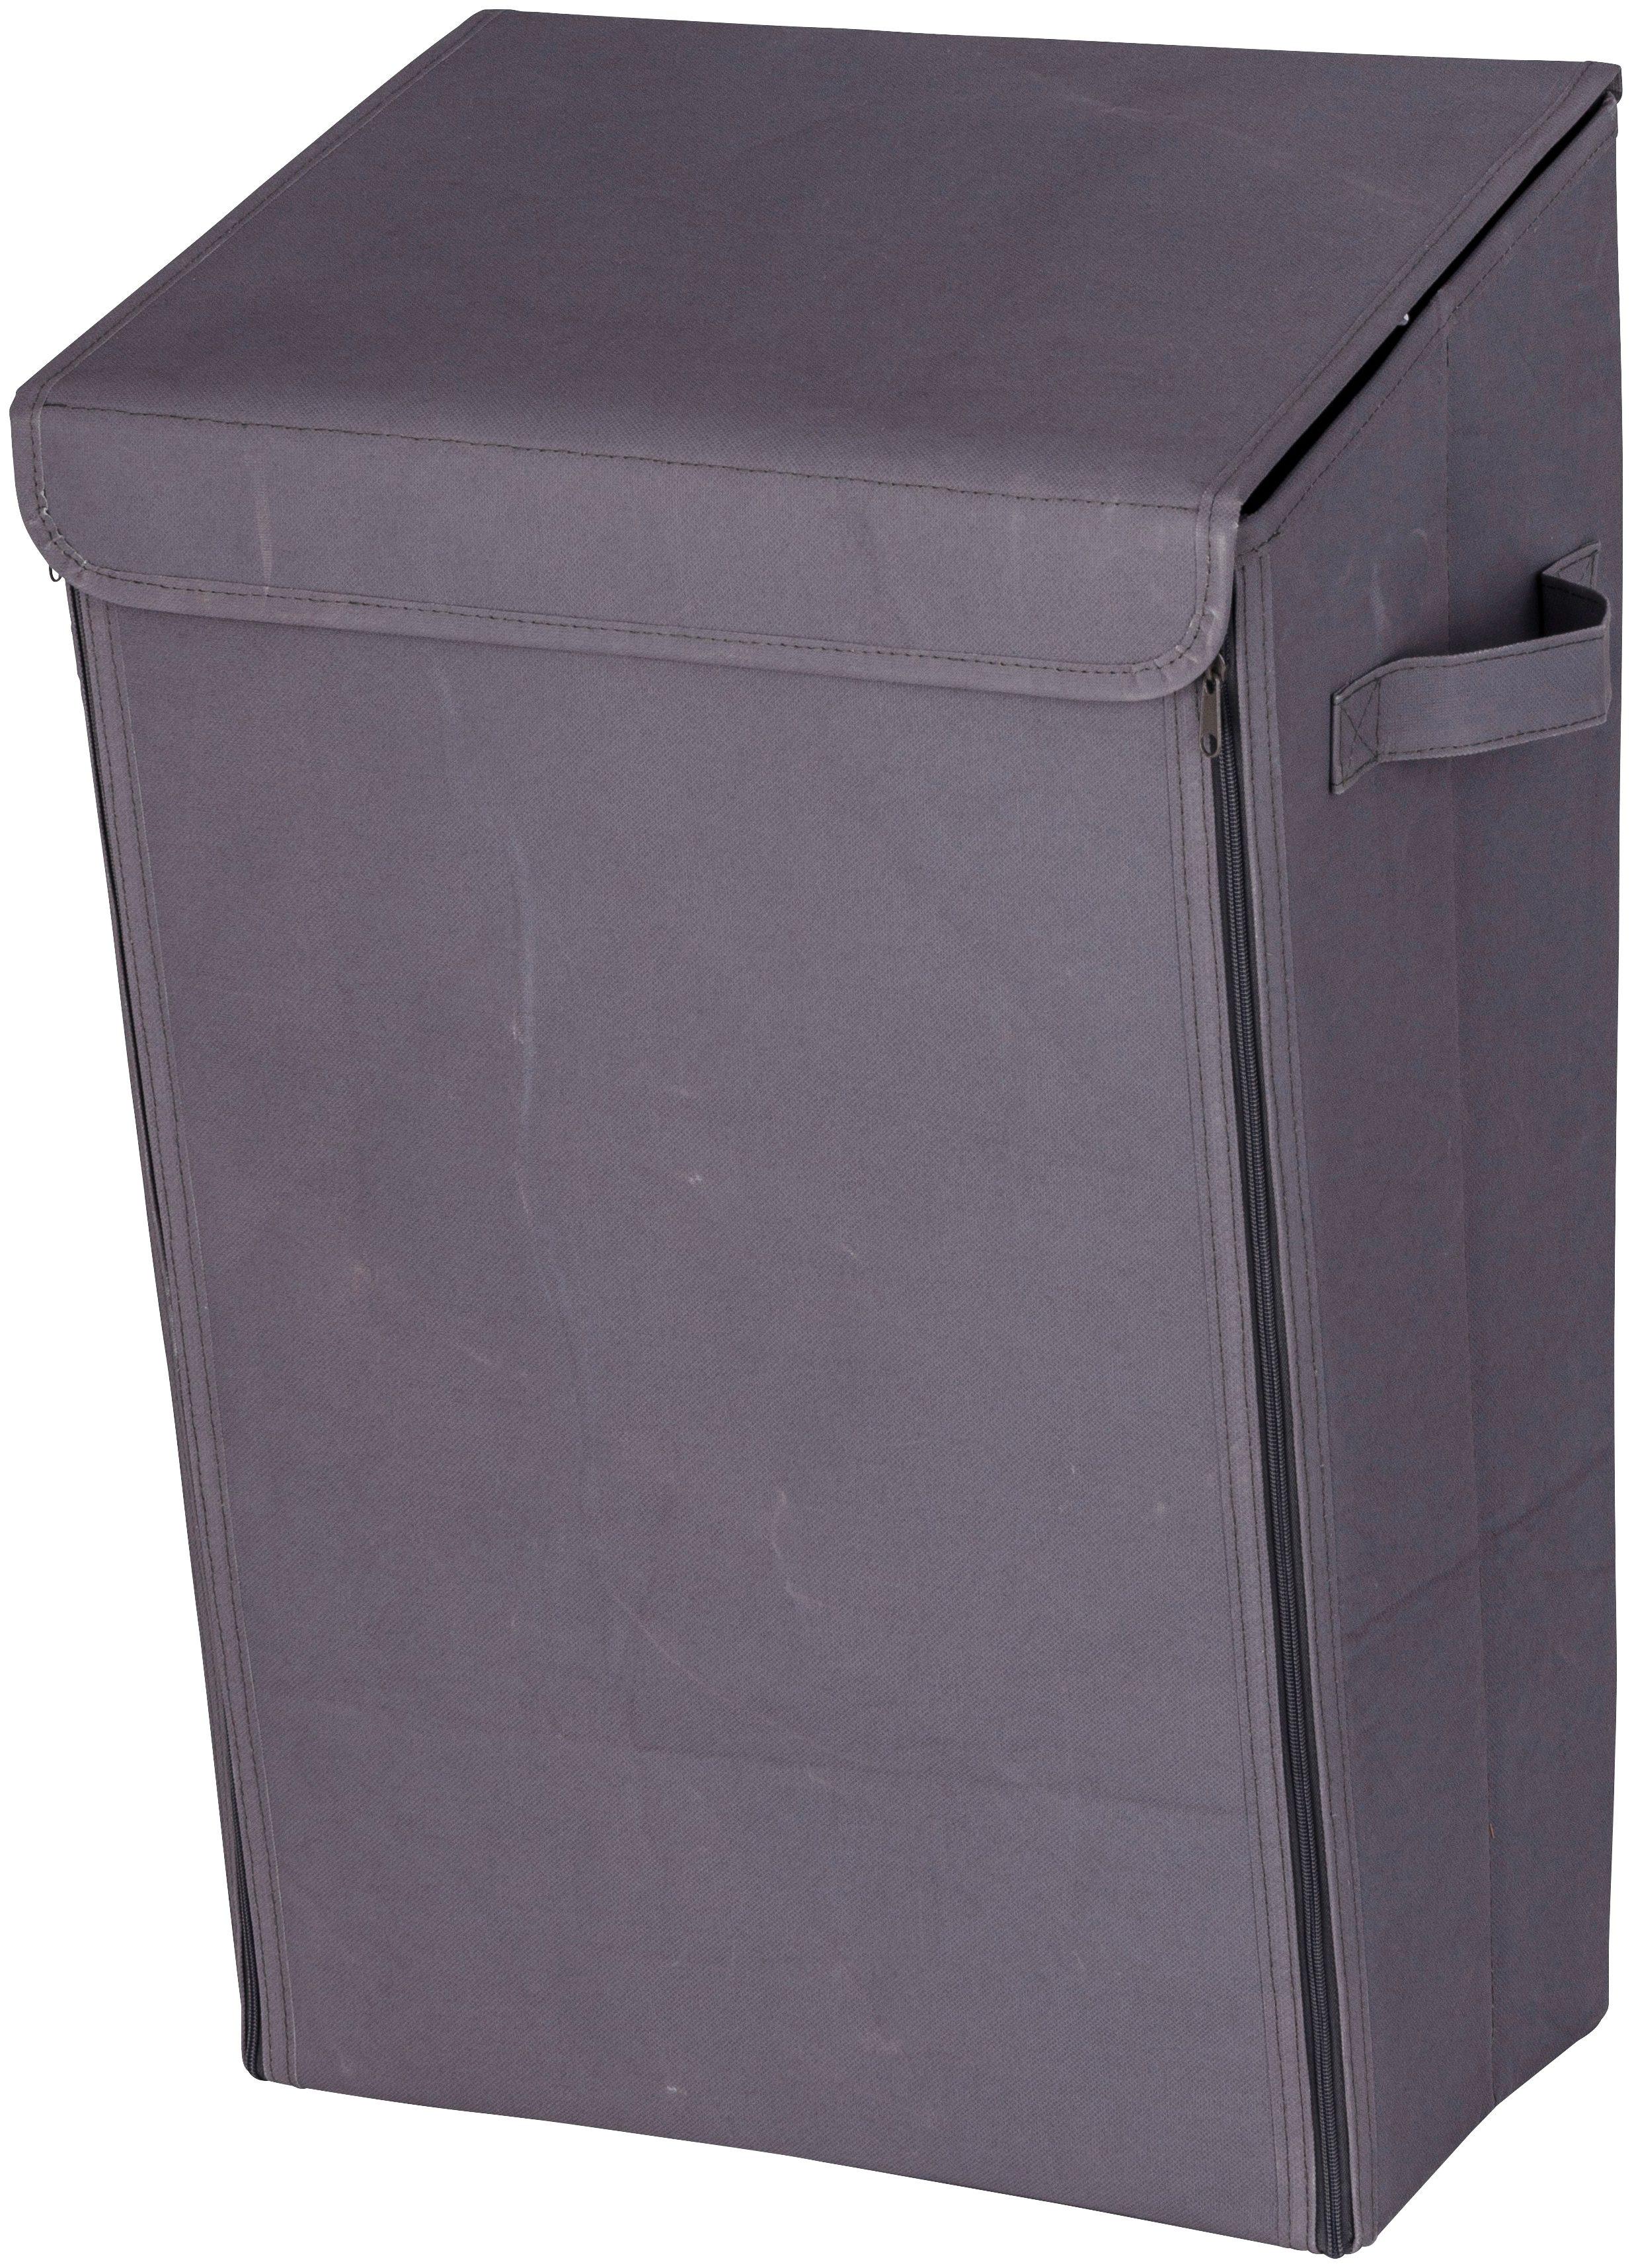 Wäschesammler »Mobiler Wäschesammler Grau«